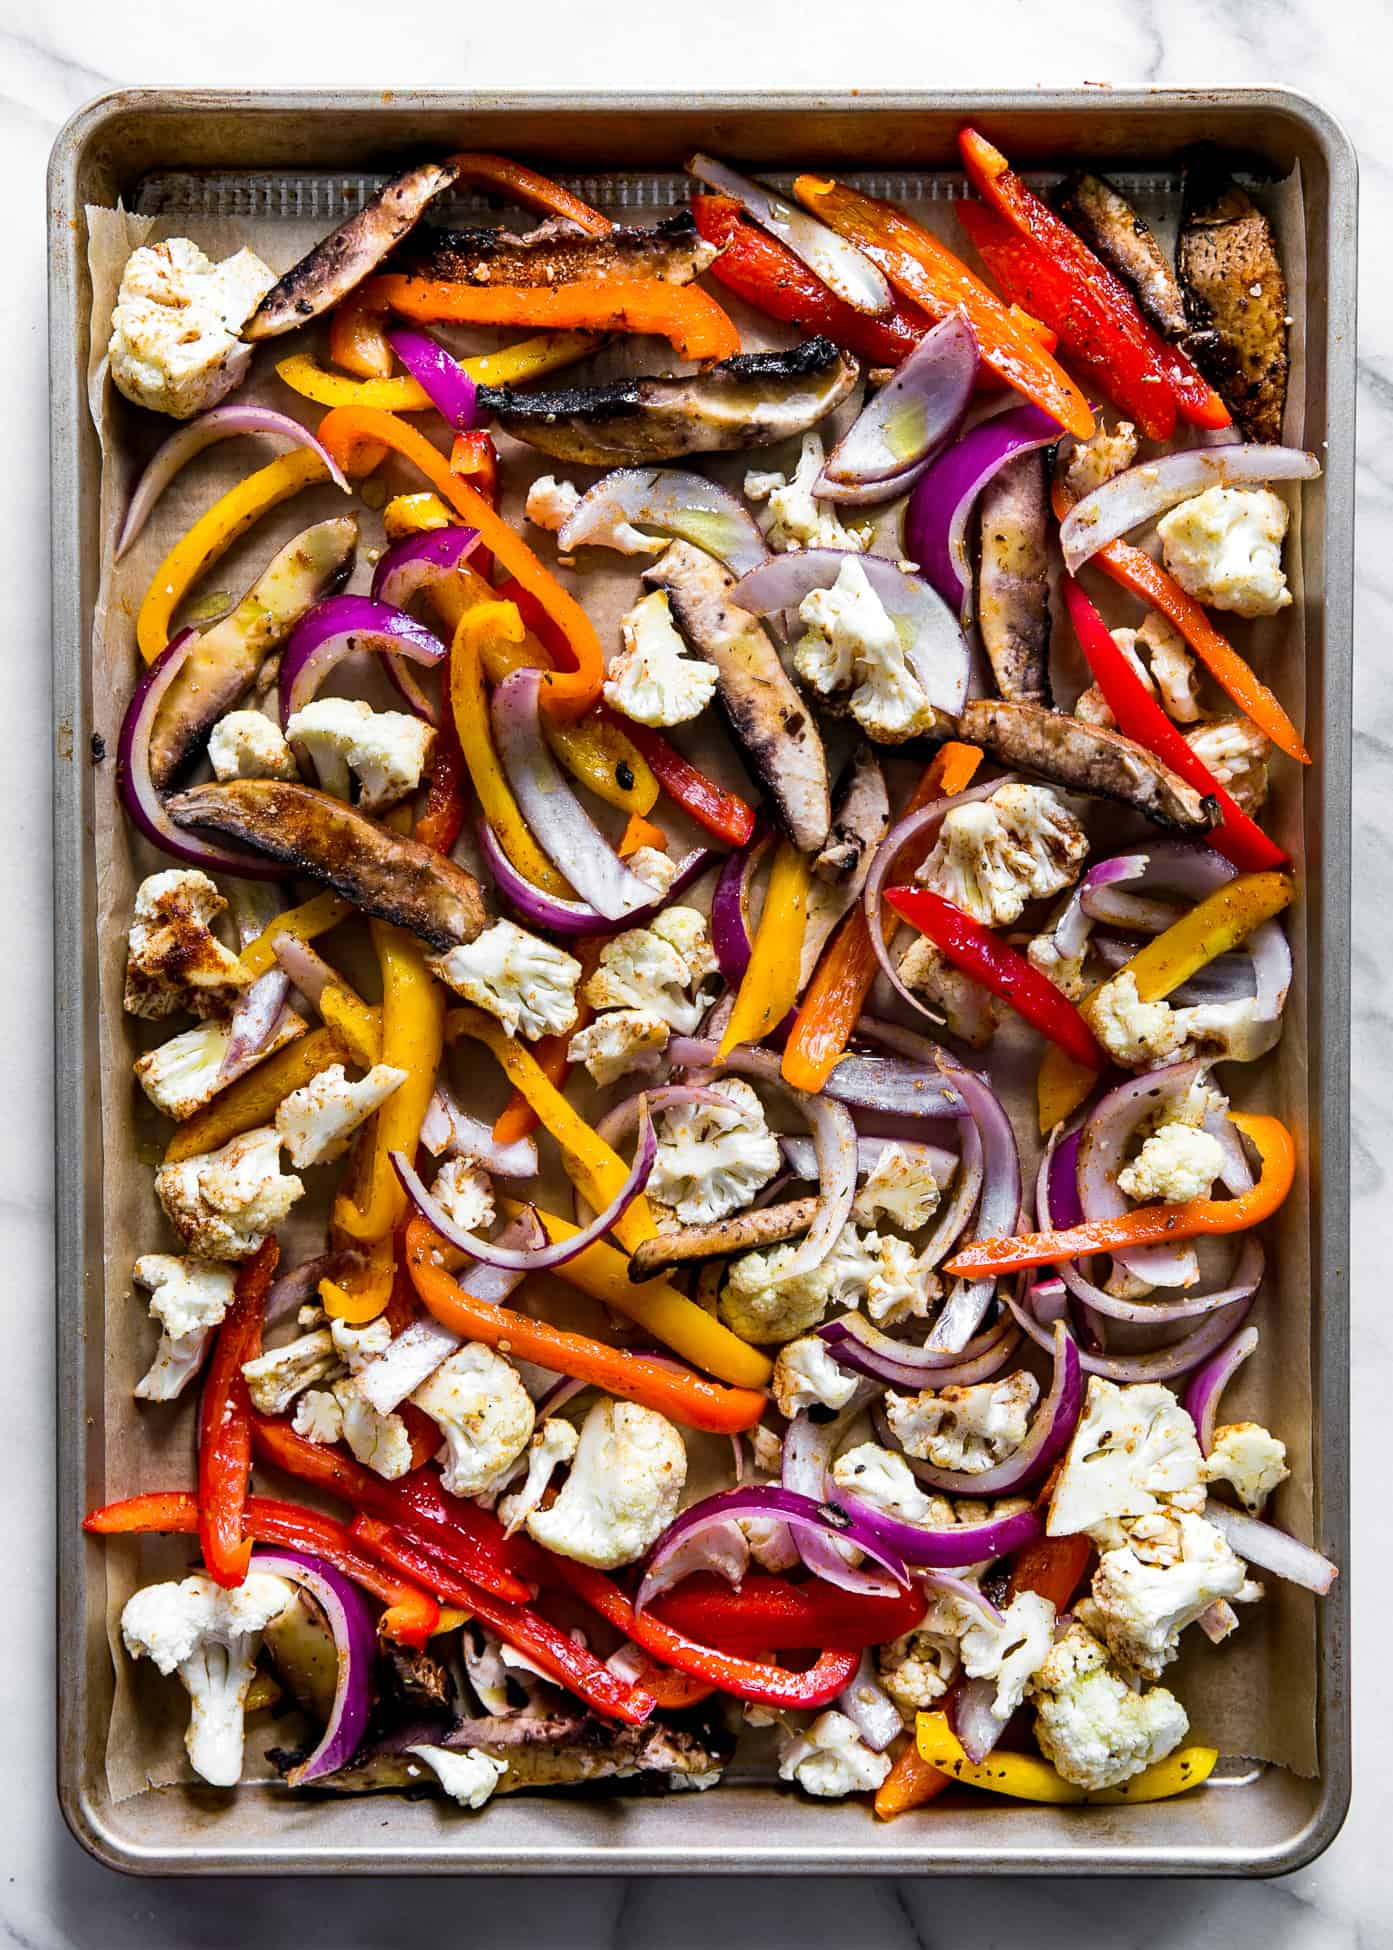 raw uncooked fajita vegetables on sheet pan